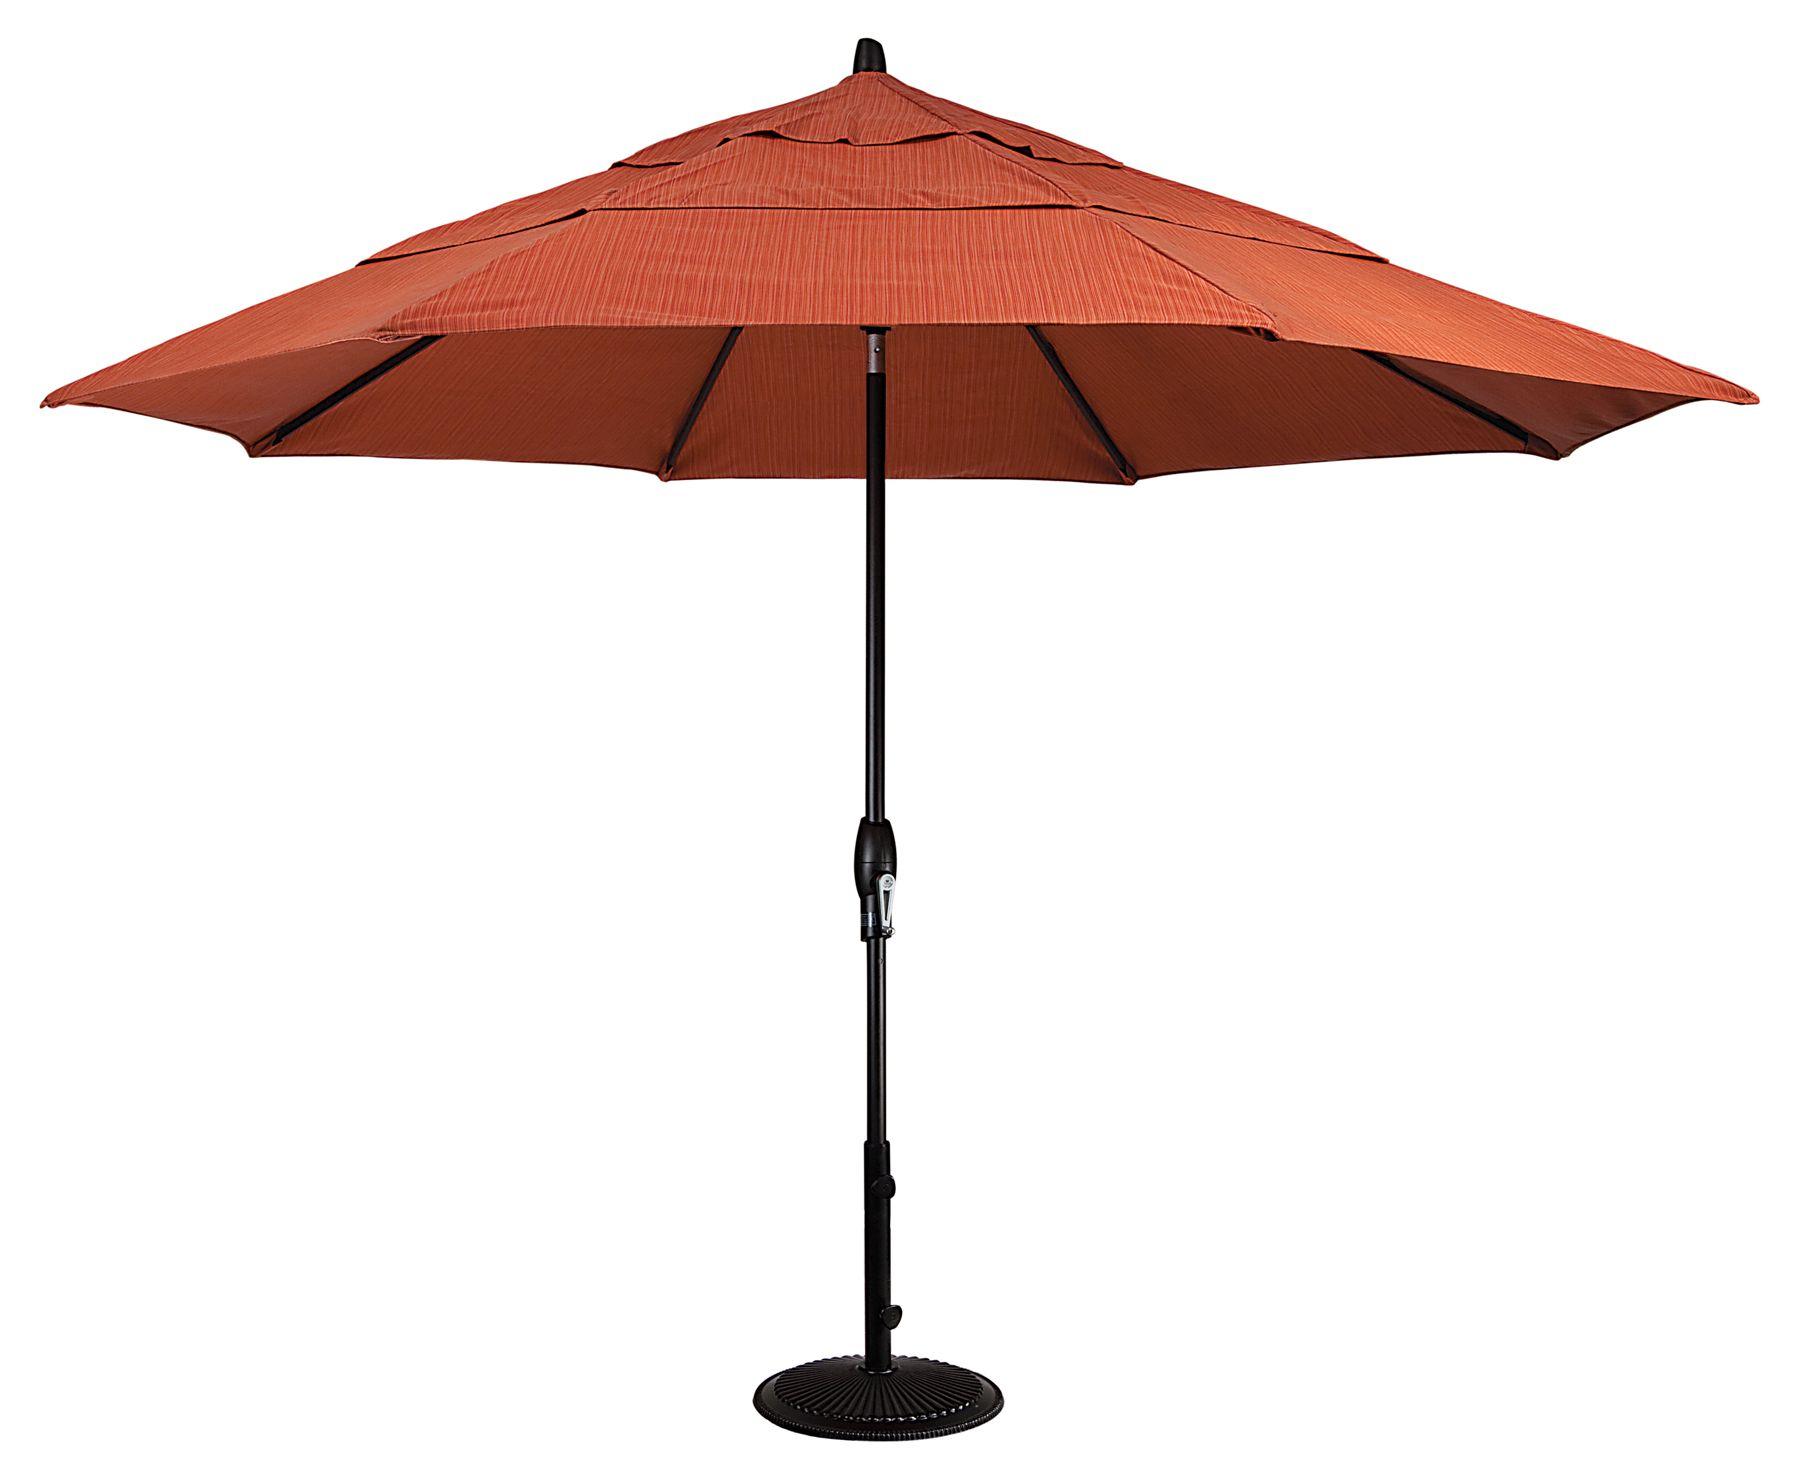 Um8129 11 Auto Tilt Umbrella By Treasure Garden Market Umbrella Patio Umbrella Patio Umbrellas